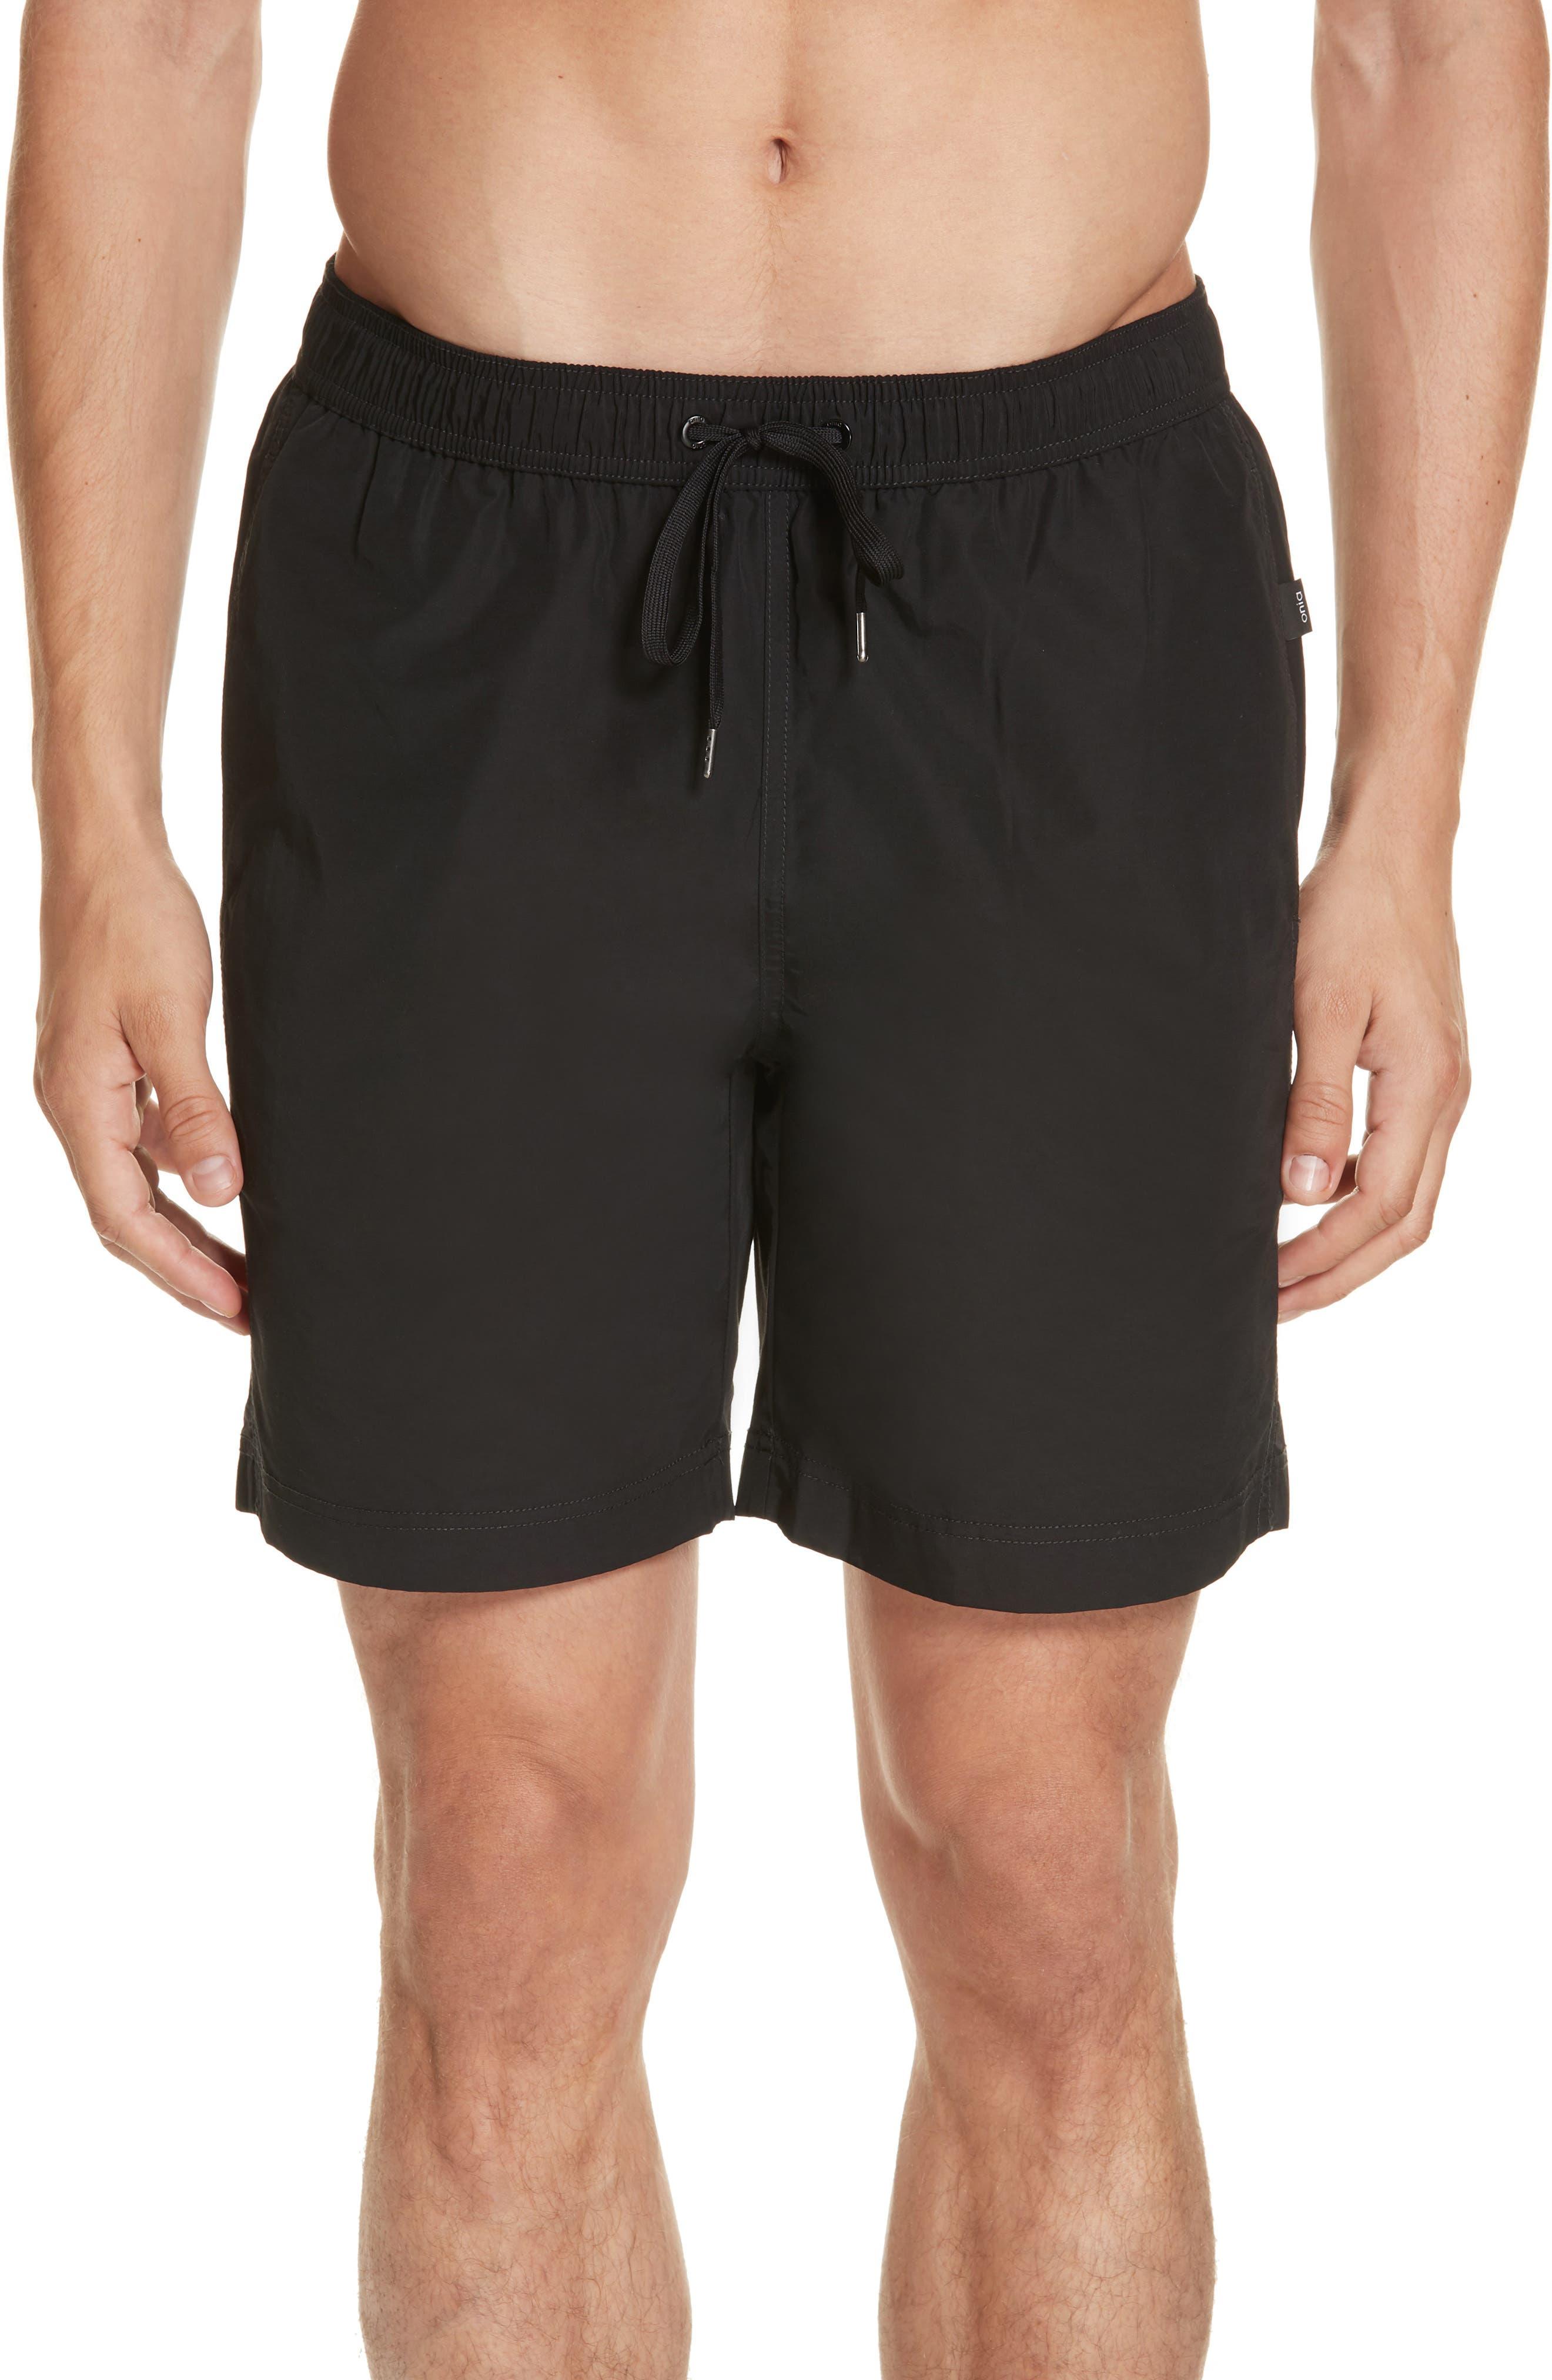 Charles Swim Trunks,                         Main,                         color, BLACK